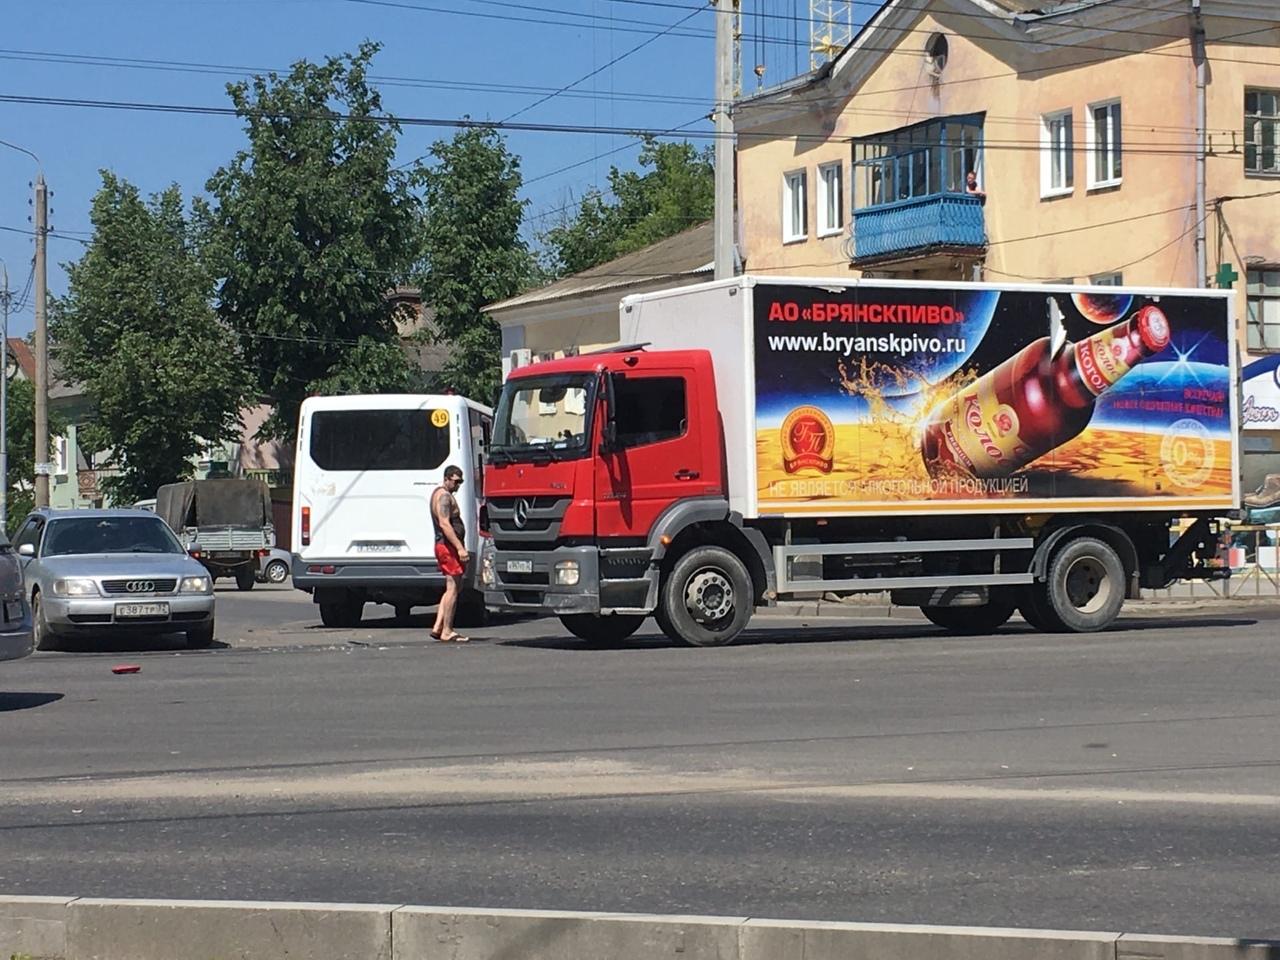 В Бежицком районе Брянска столкнулись маршрутка №49 и грузовик